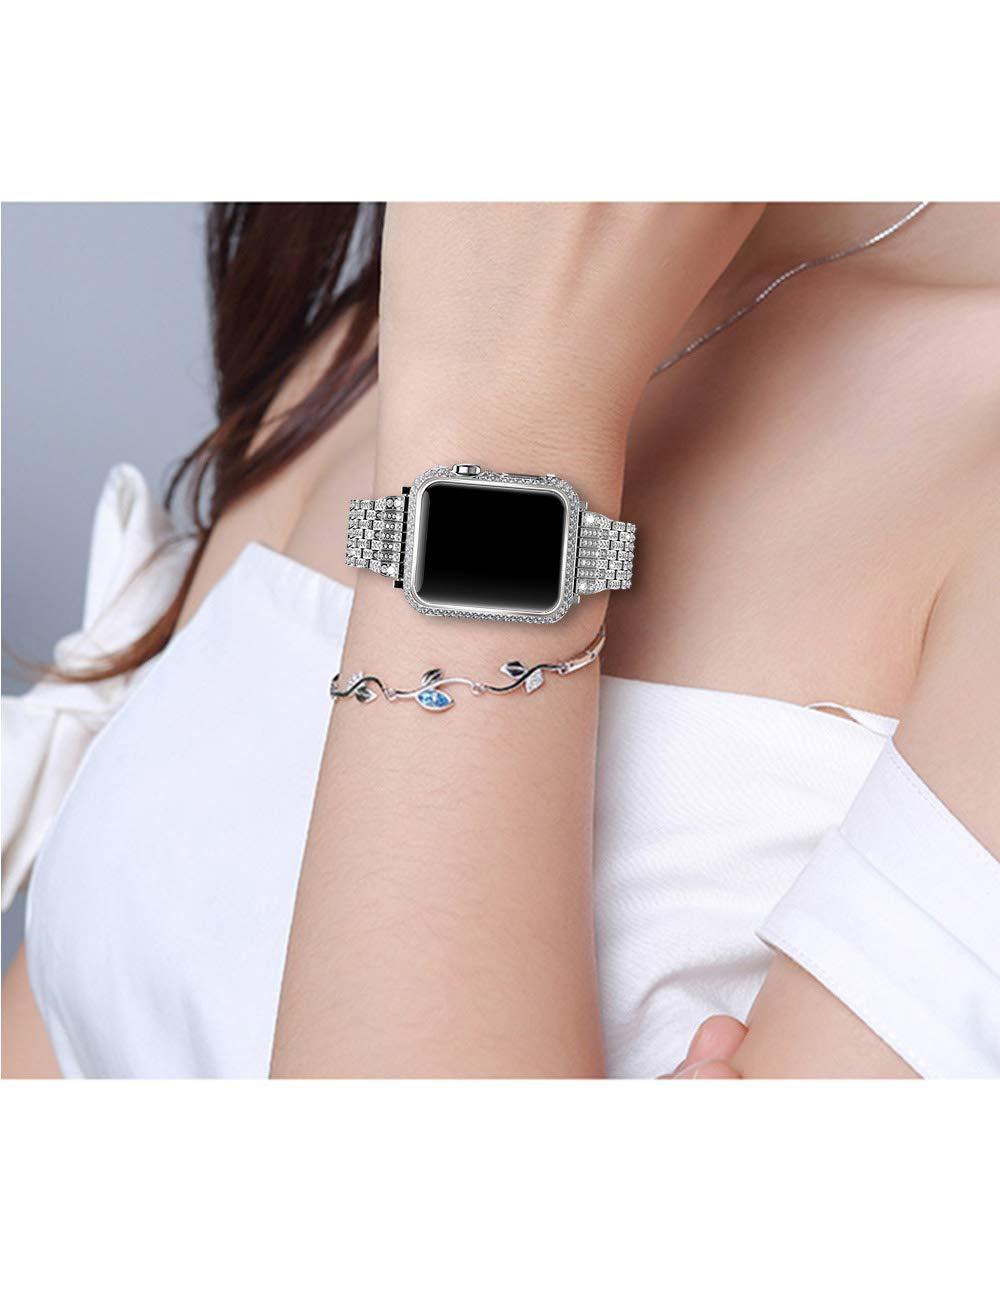 Xihuan 42Mm / 38Mm Handarbeit Diamant-Uhrengehäuse Verkrustete Strass Diamant-Uhrengehäuse Handarbeit Kompatibel Apple Watch Serie 3 2 1 55723c